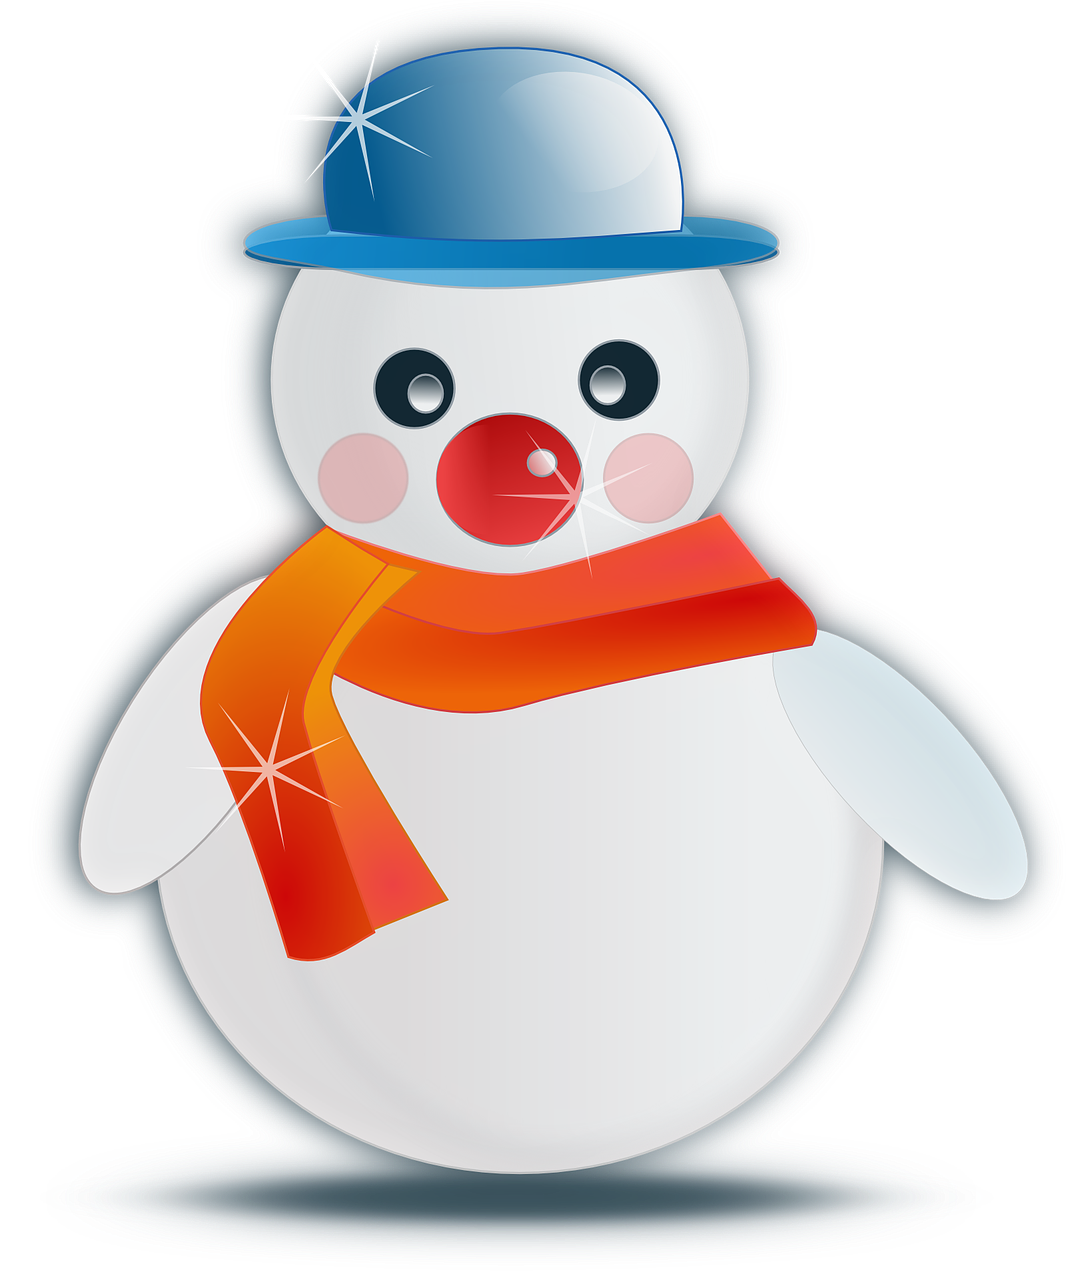 Vacation Snowman Winter Christmas Holiday Vacation